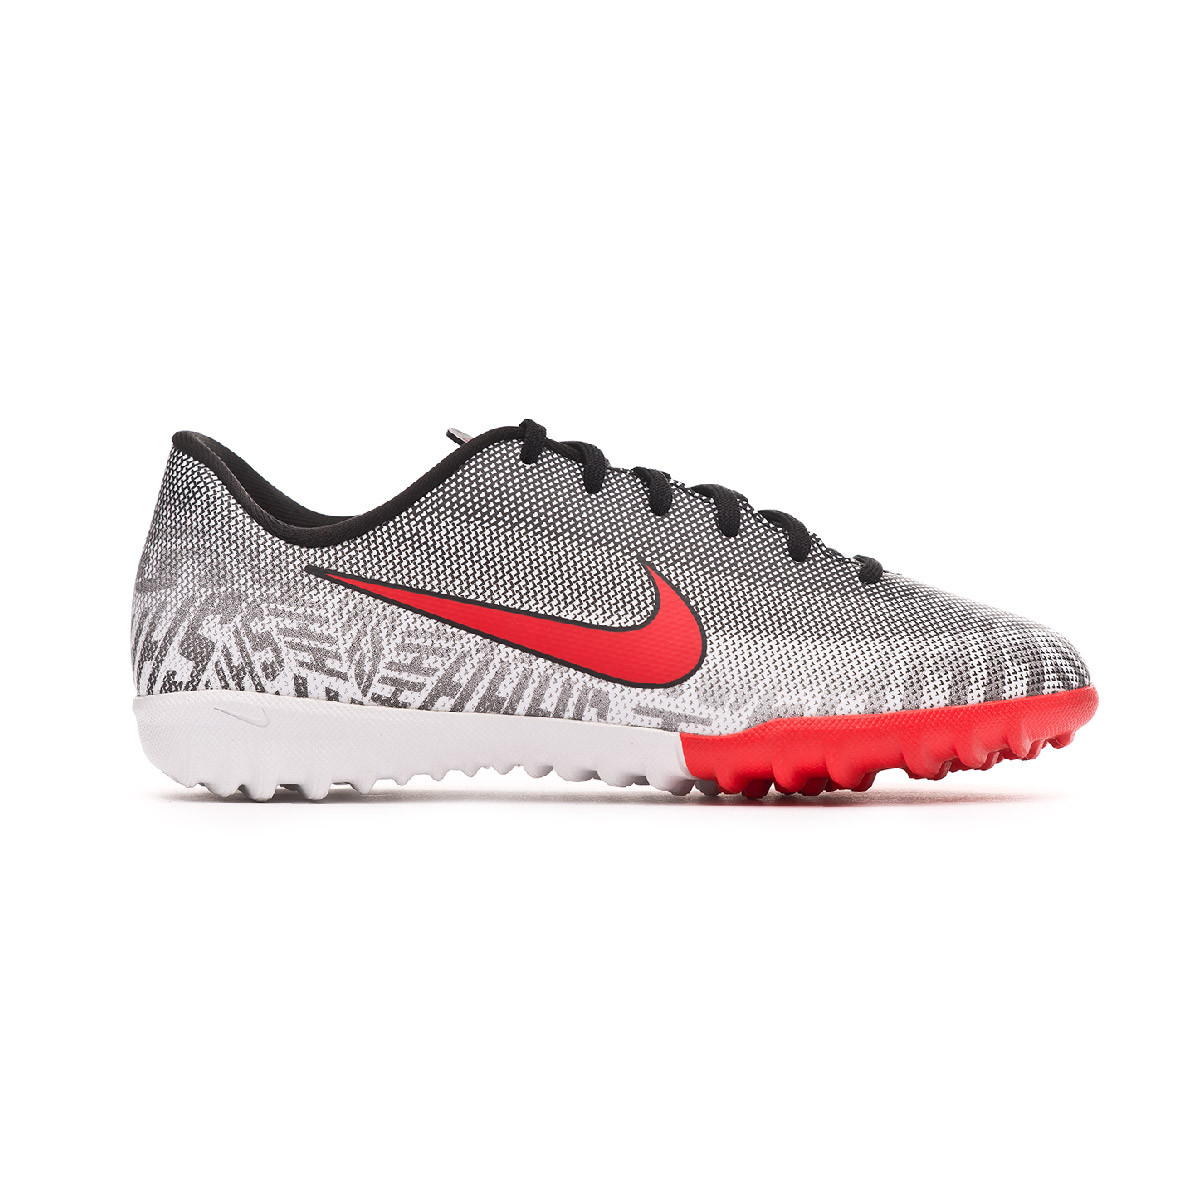 Scarpe Nike Mercurial VaporX XII Academy Neymar Jr Turf Niño  White-Challenge red-Black - Negozio di calcio Fútbol Emotion cb5b5c406bf